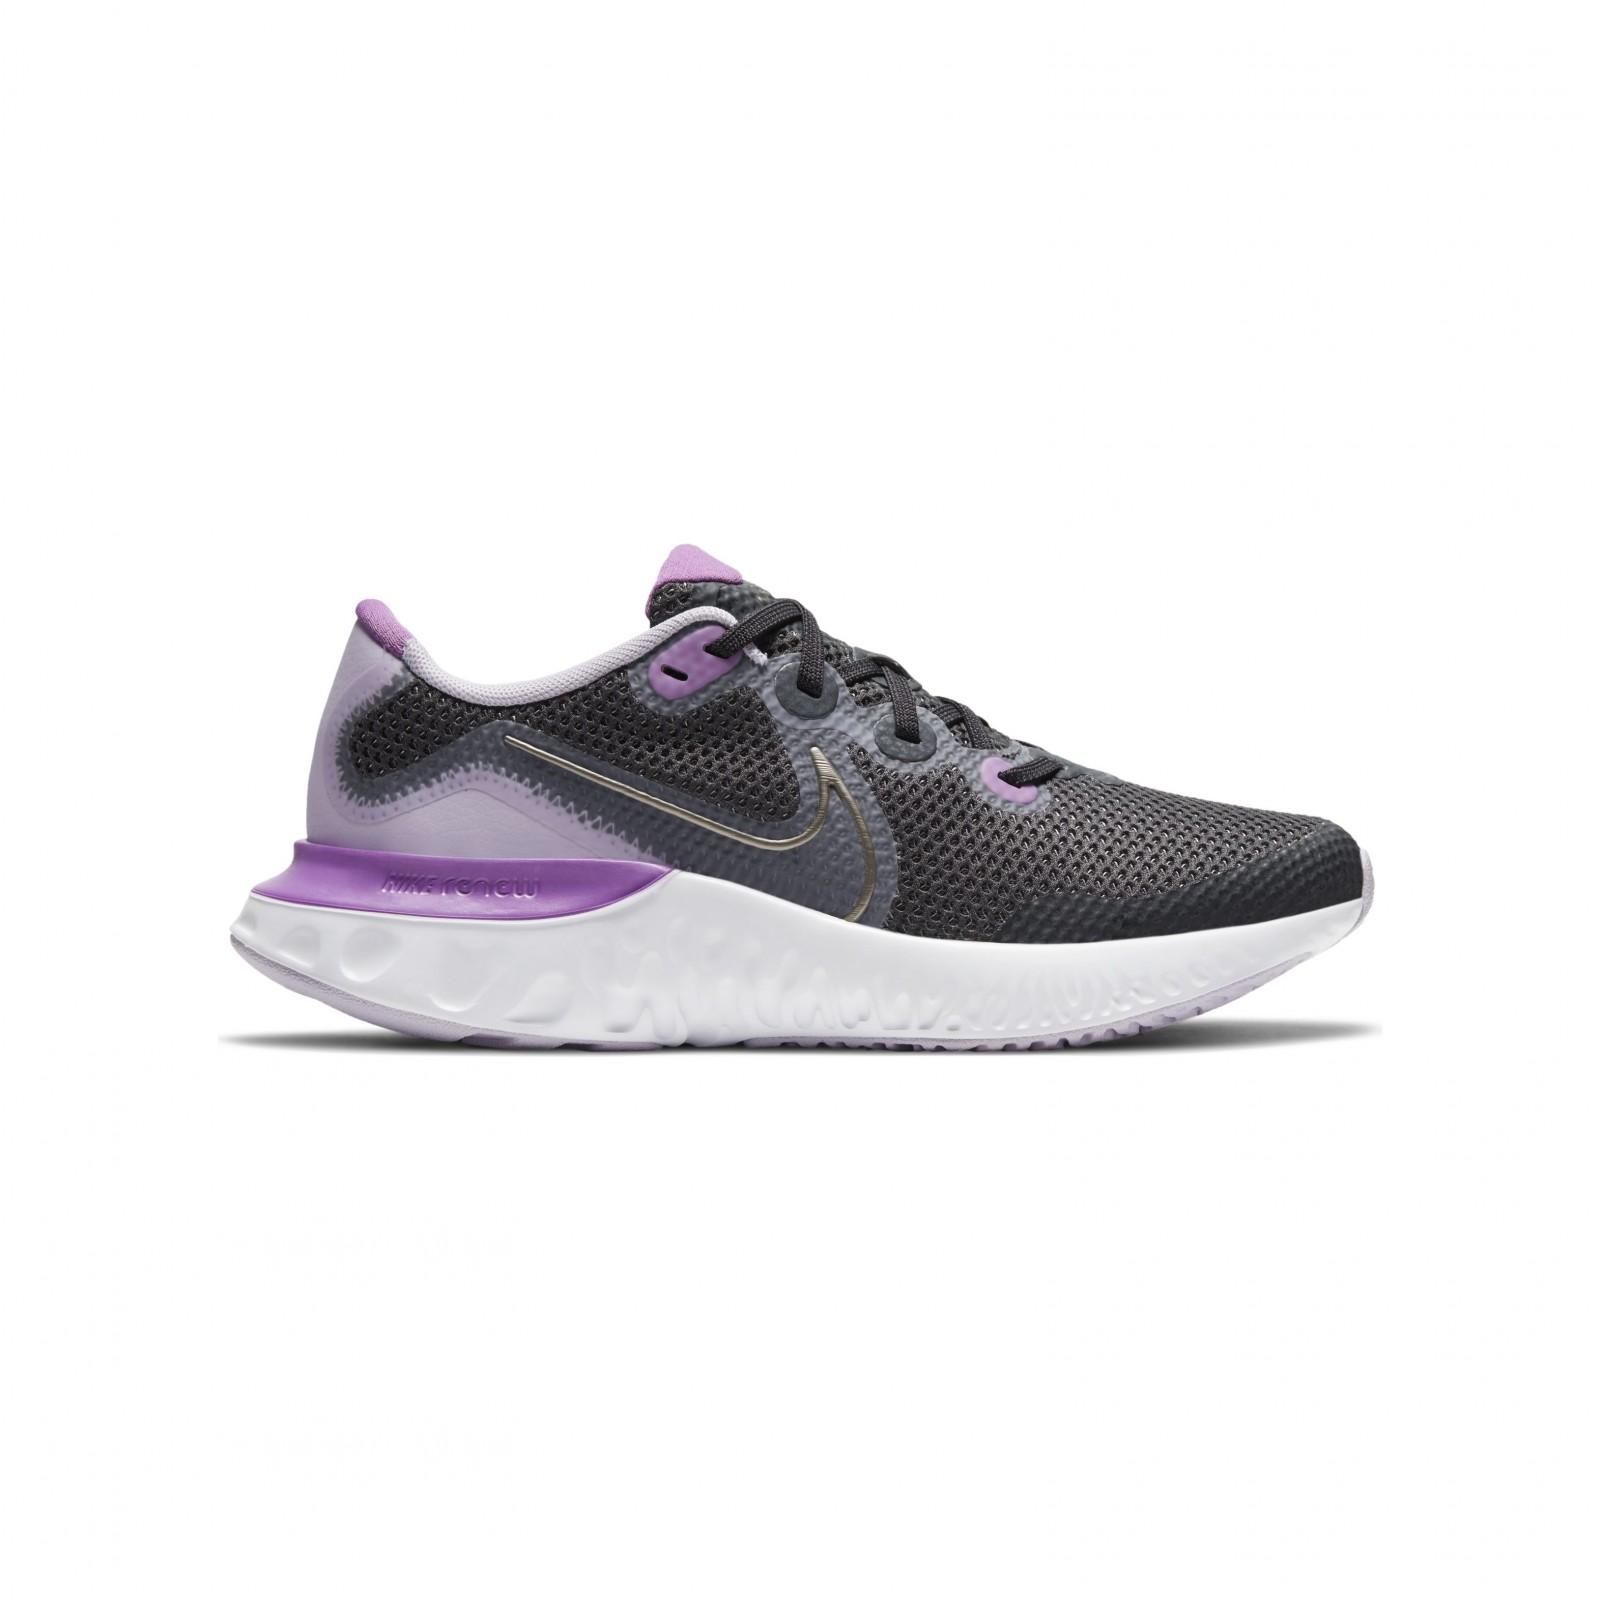 Nike Renew Run DK SMOKE GREY/MTLC PEWTER-VIOLET FROST